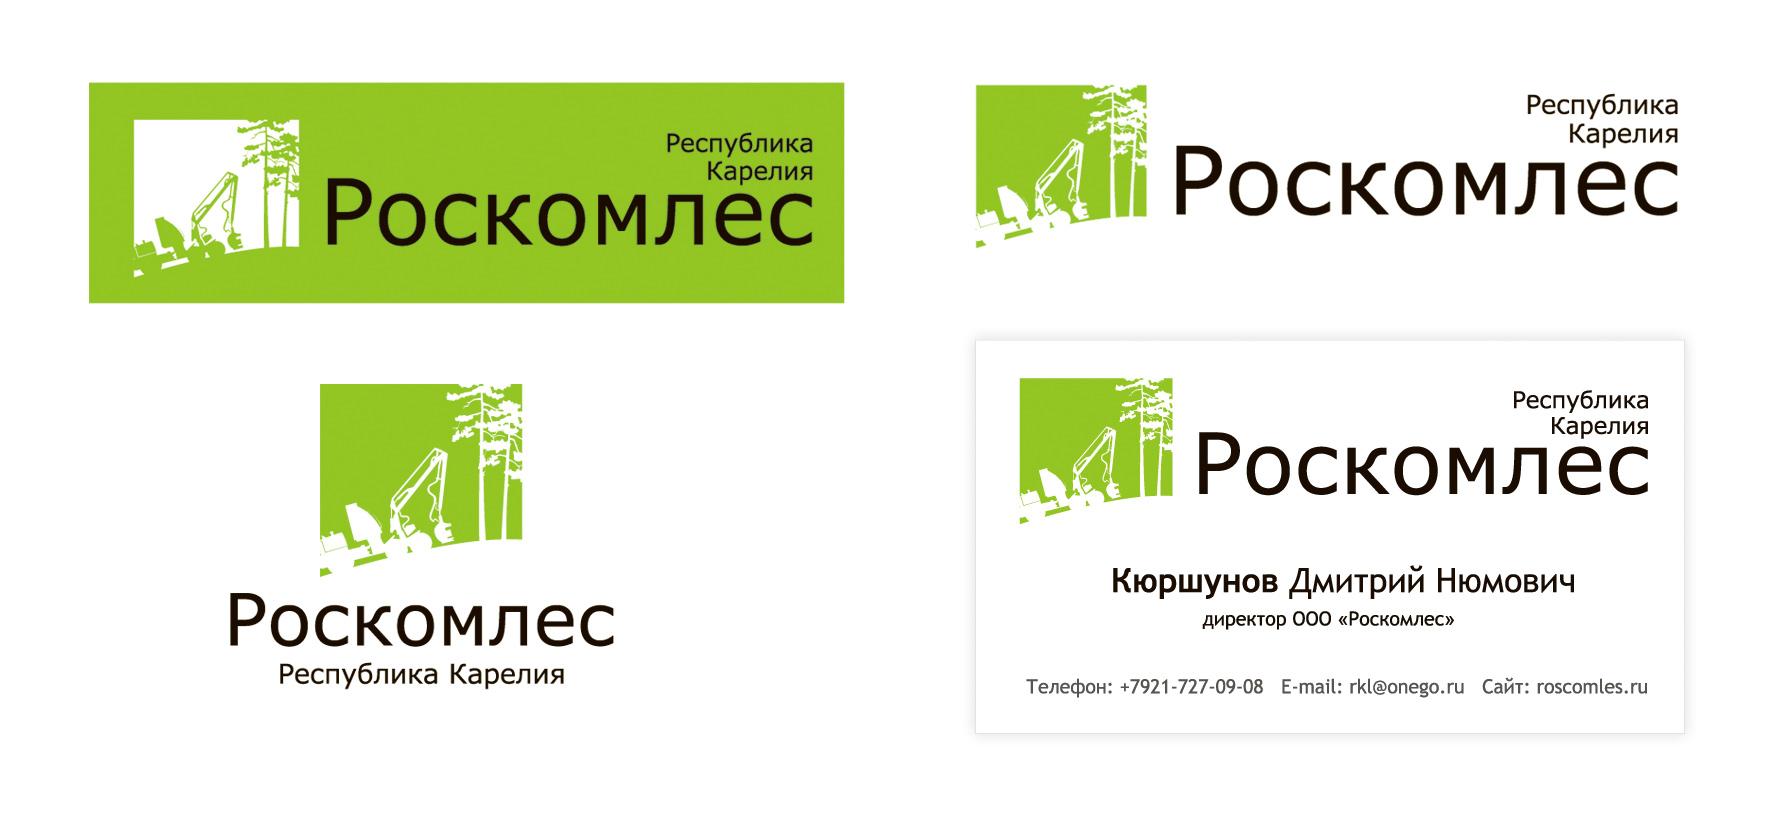 Logging company's logo